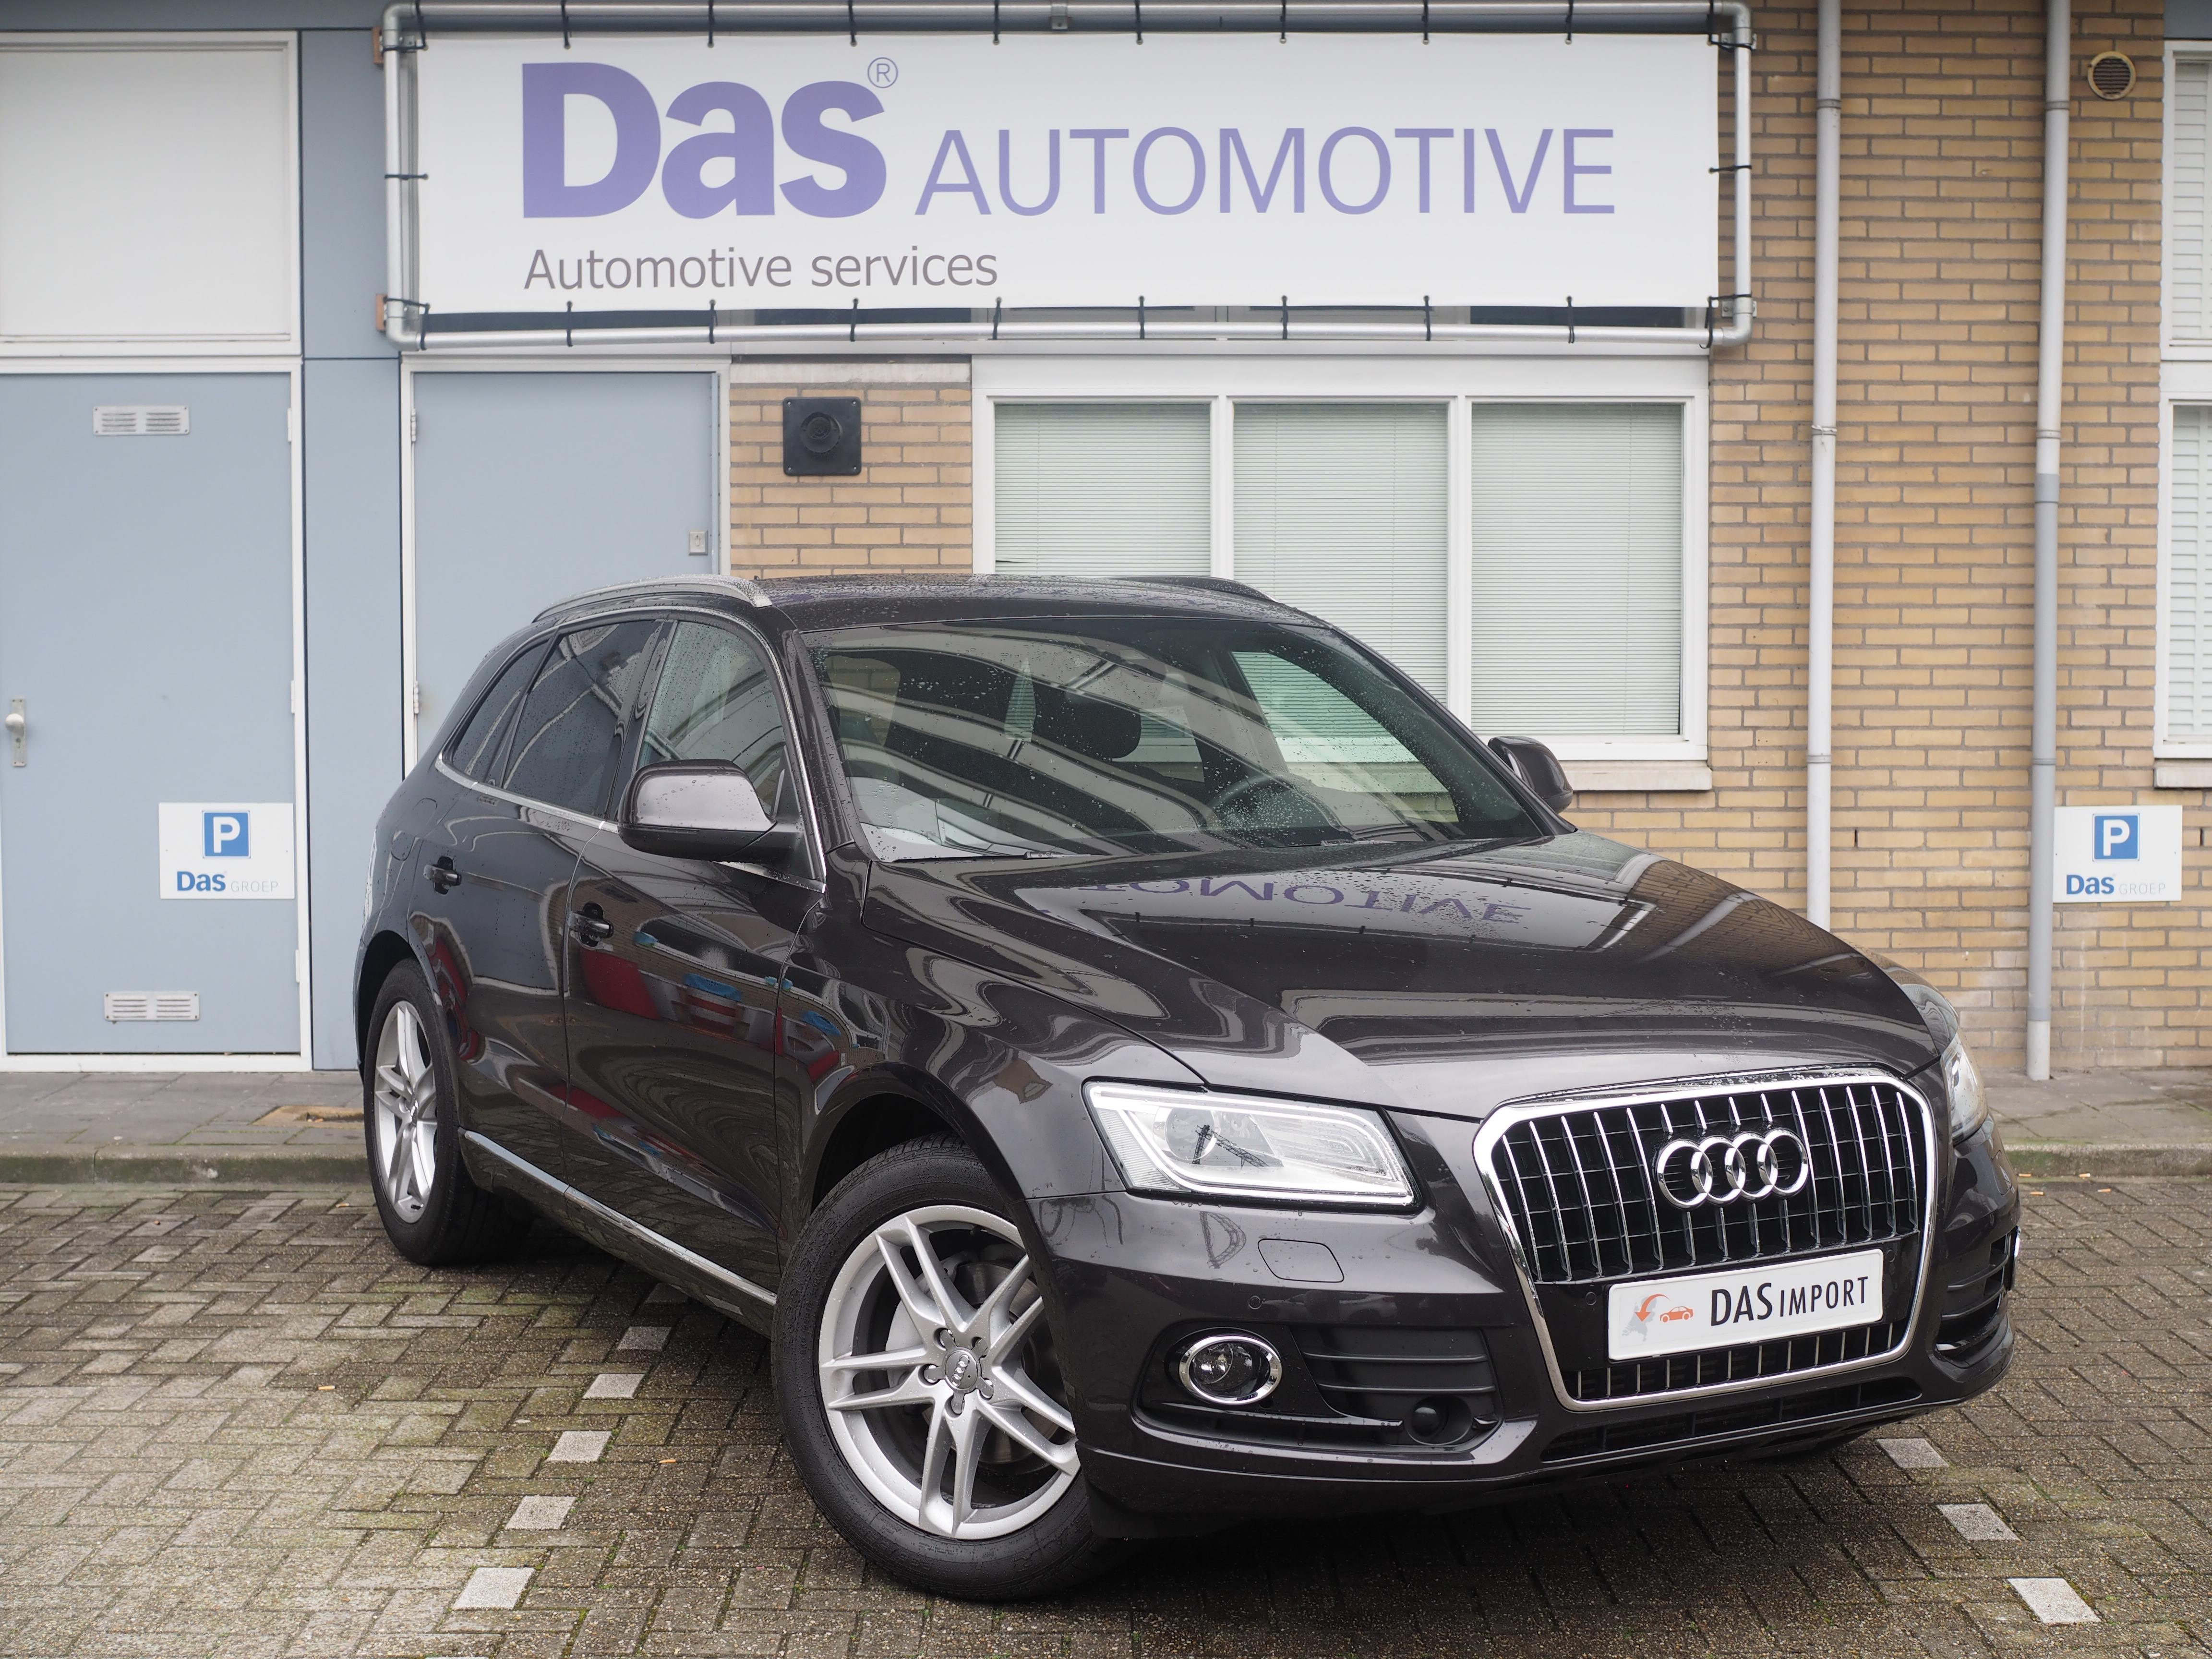 Importauto: Audi Q5 Diesel 2.0 TDI 105kW 5/2013